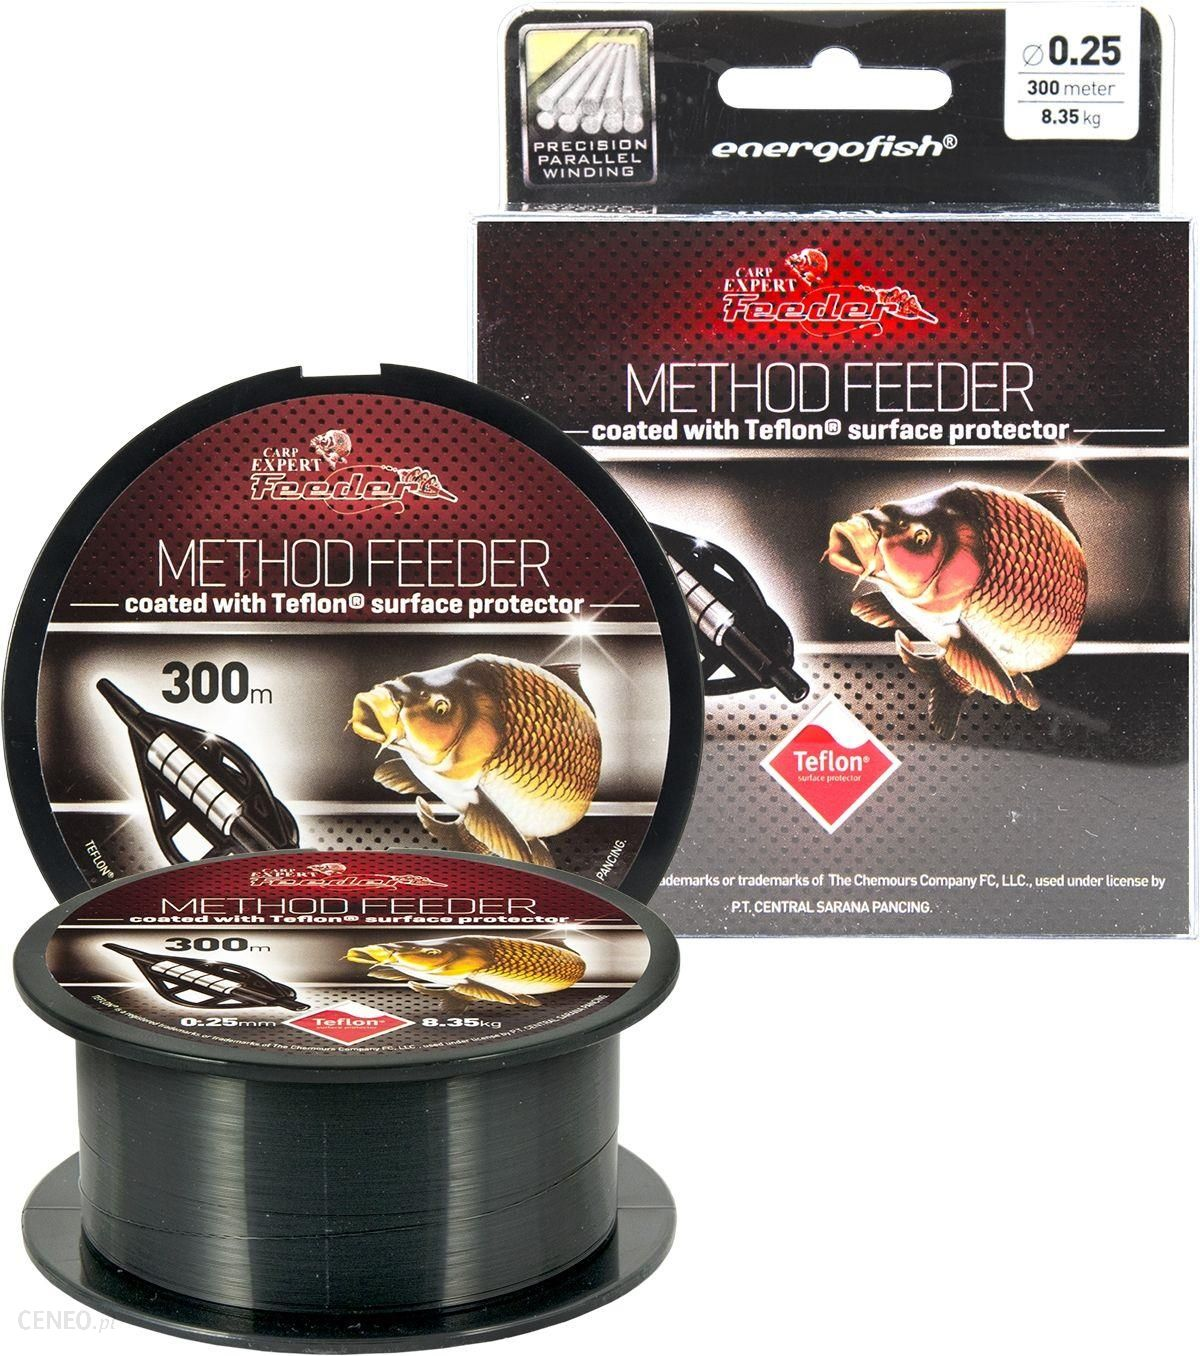 Energofish Carp Expert Method Feeder Teflon 0